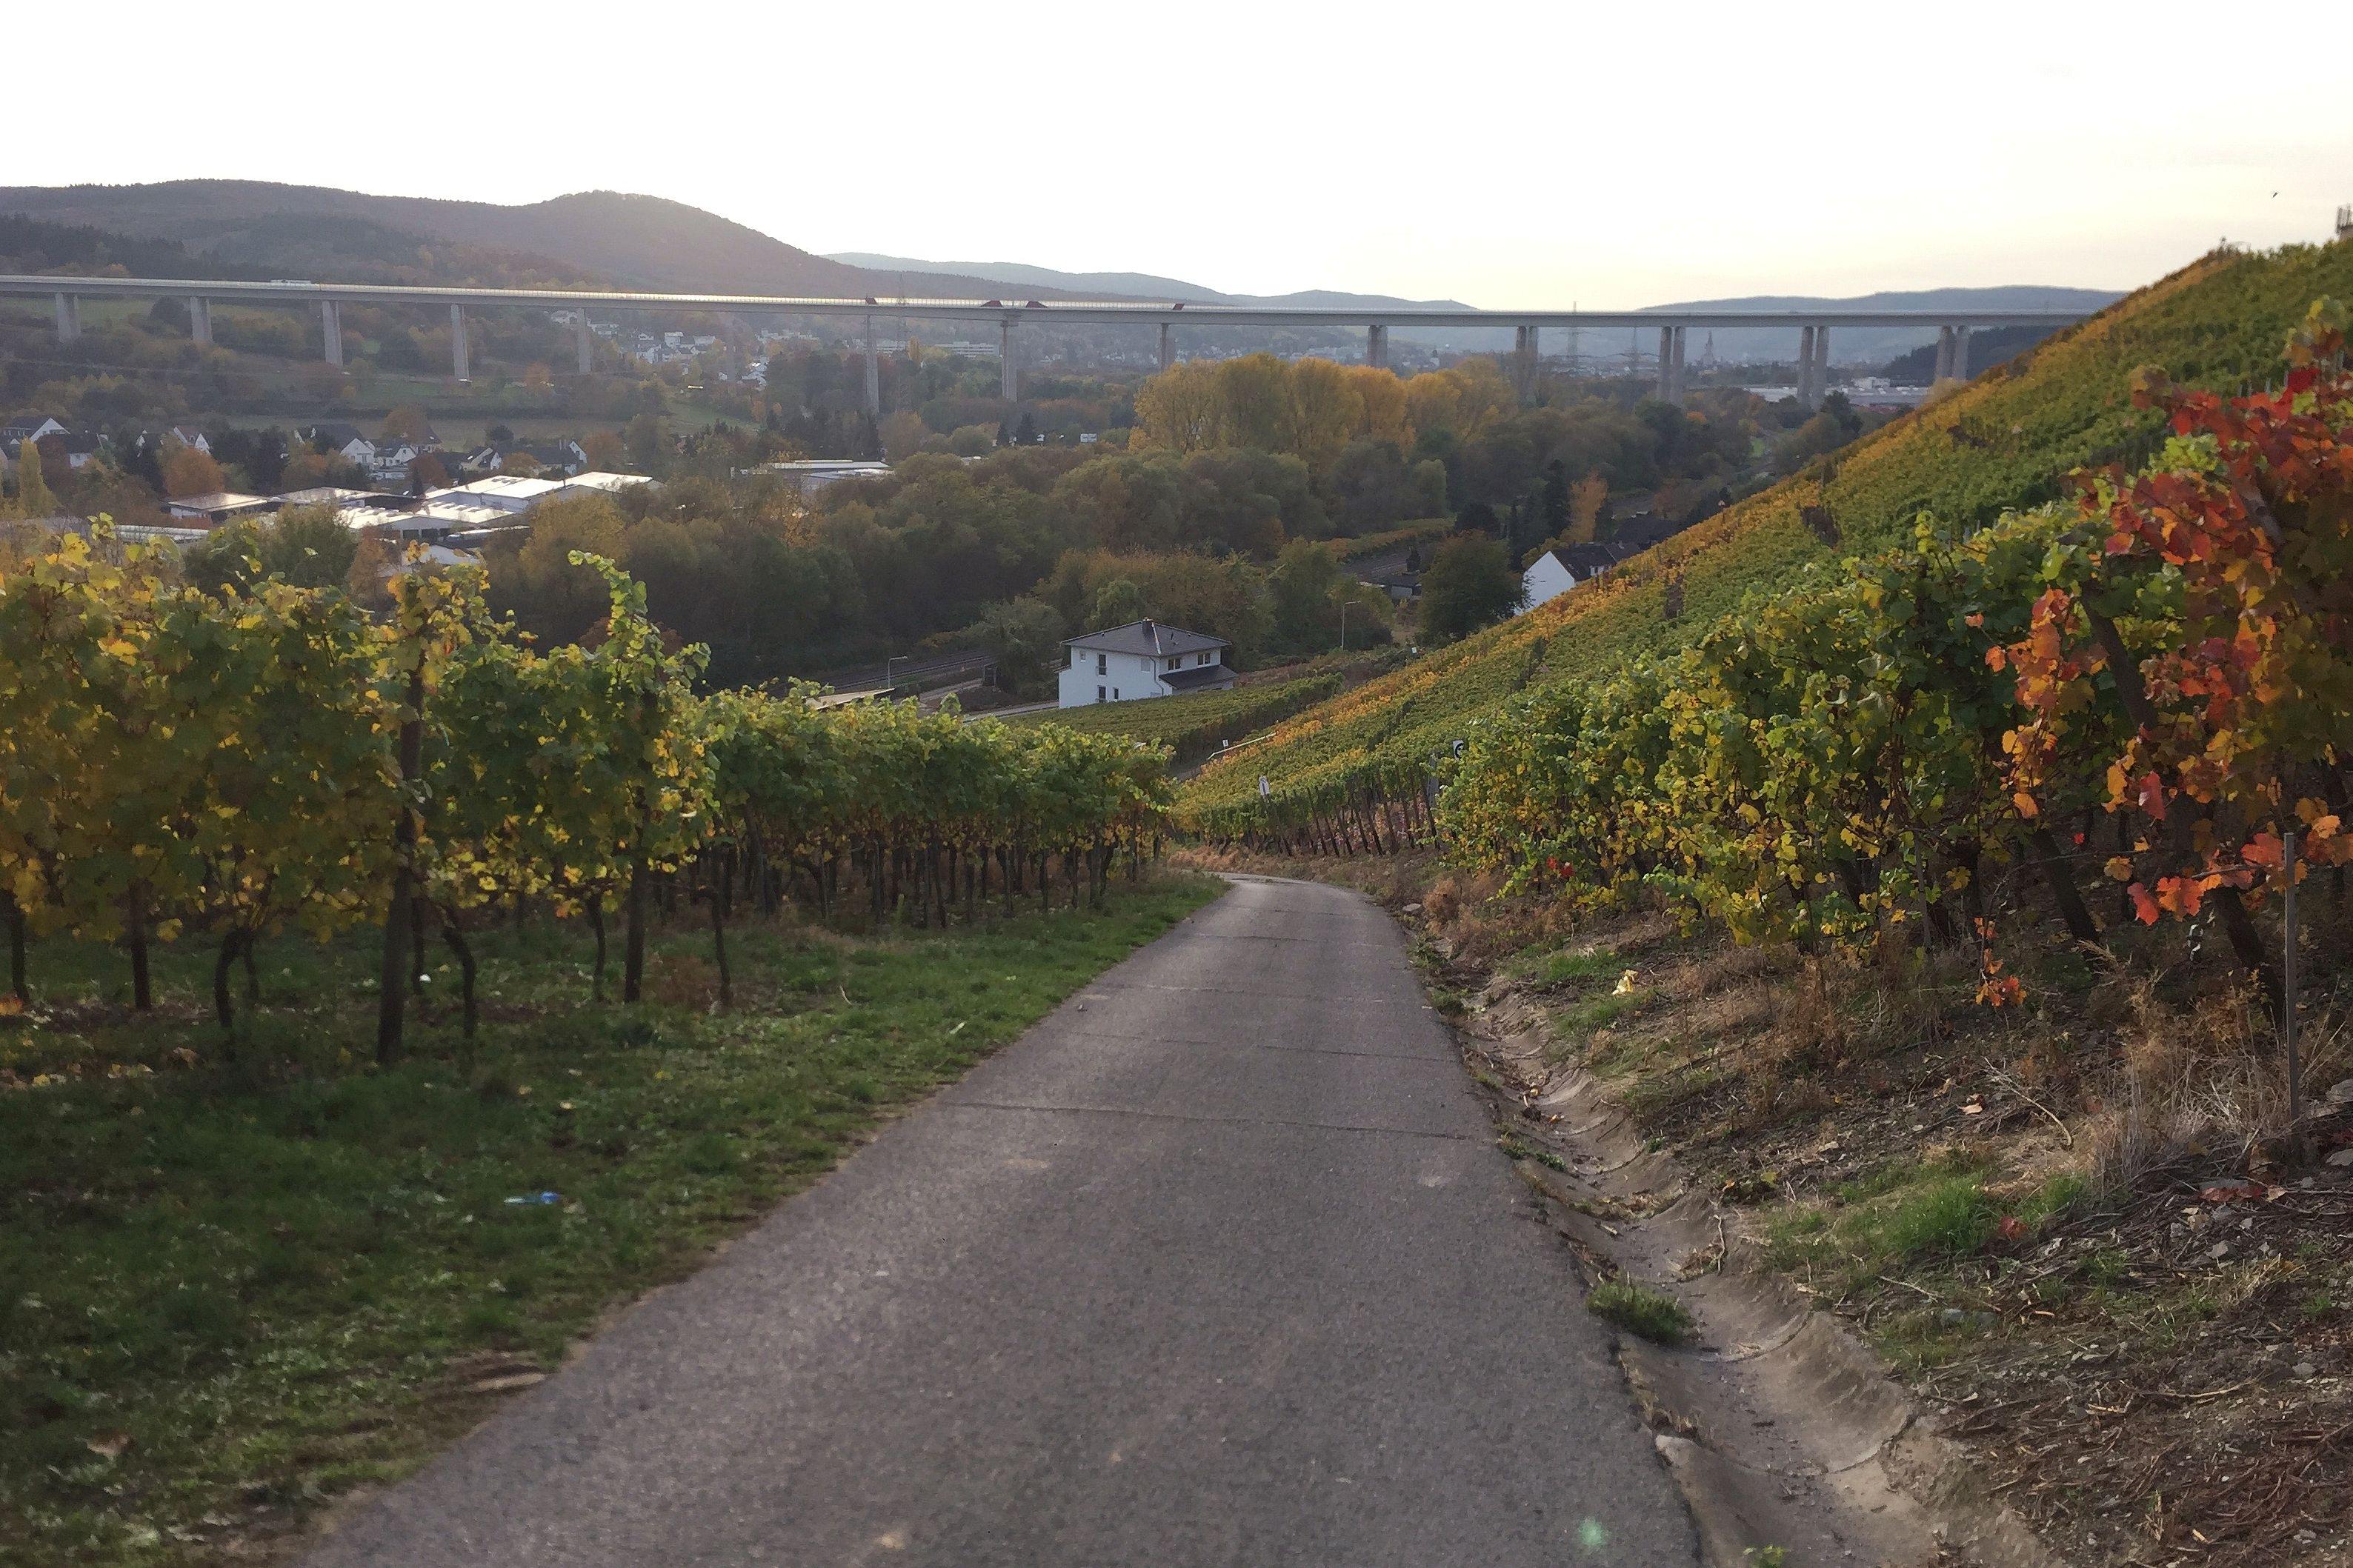 Autobahnbrücke über das Ahrtal, Blick Richtung Eifel